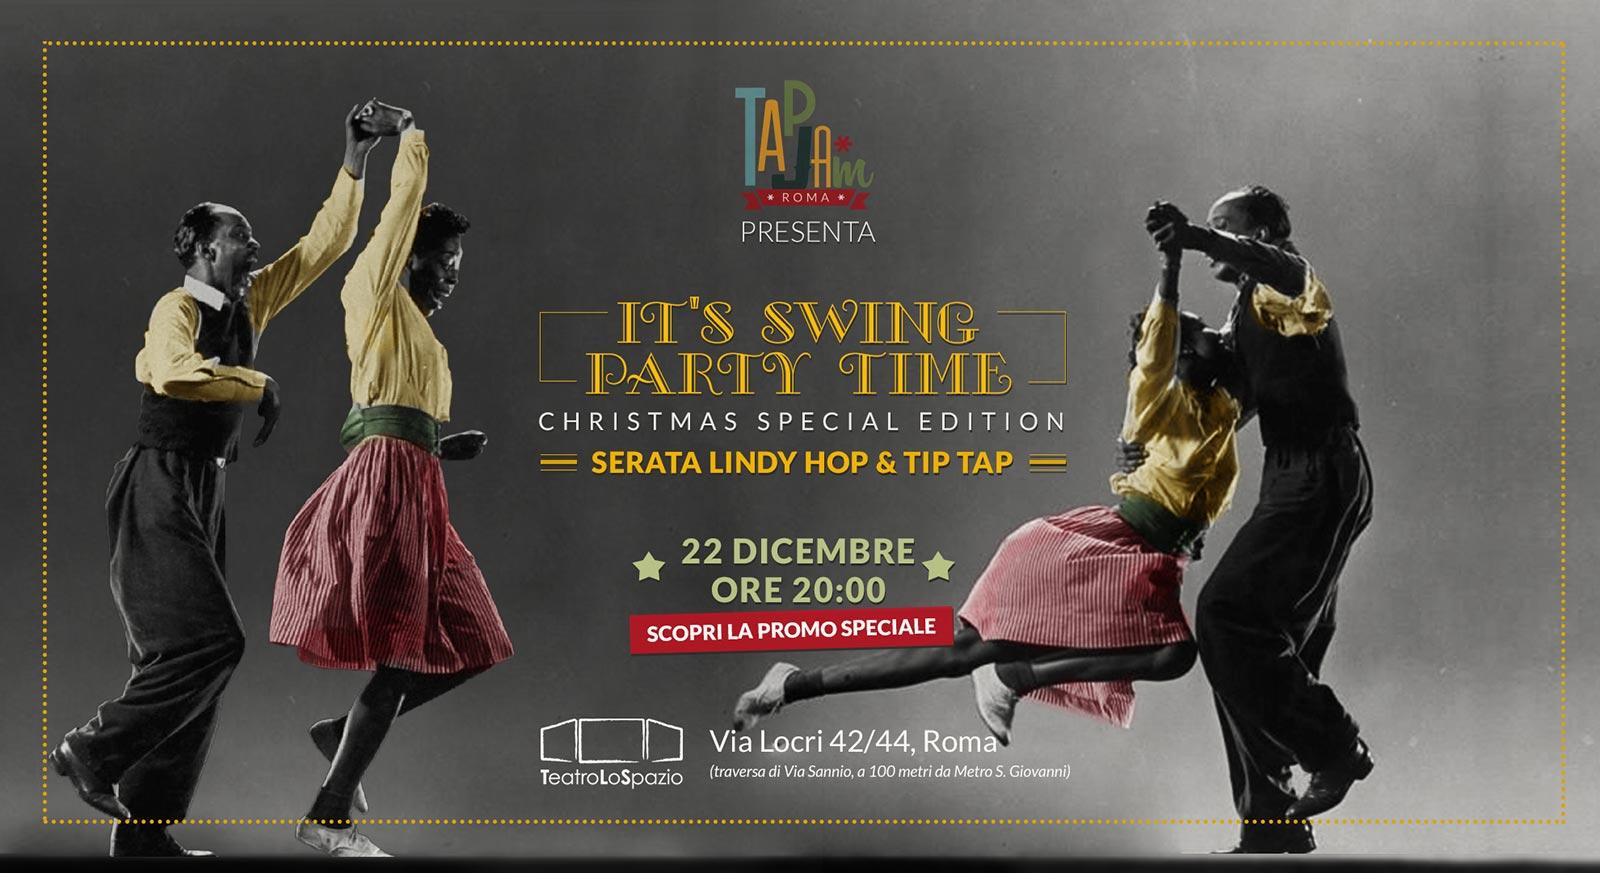 TapJam - TeatroLoSpazio - 22 dicembre 2019 - Via Locri 42 00183 - Roma